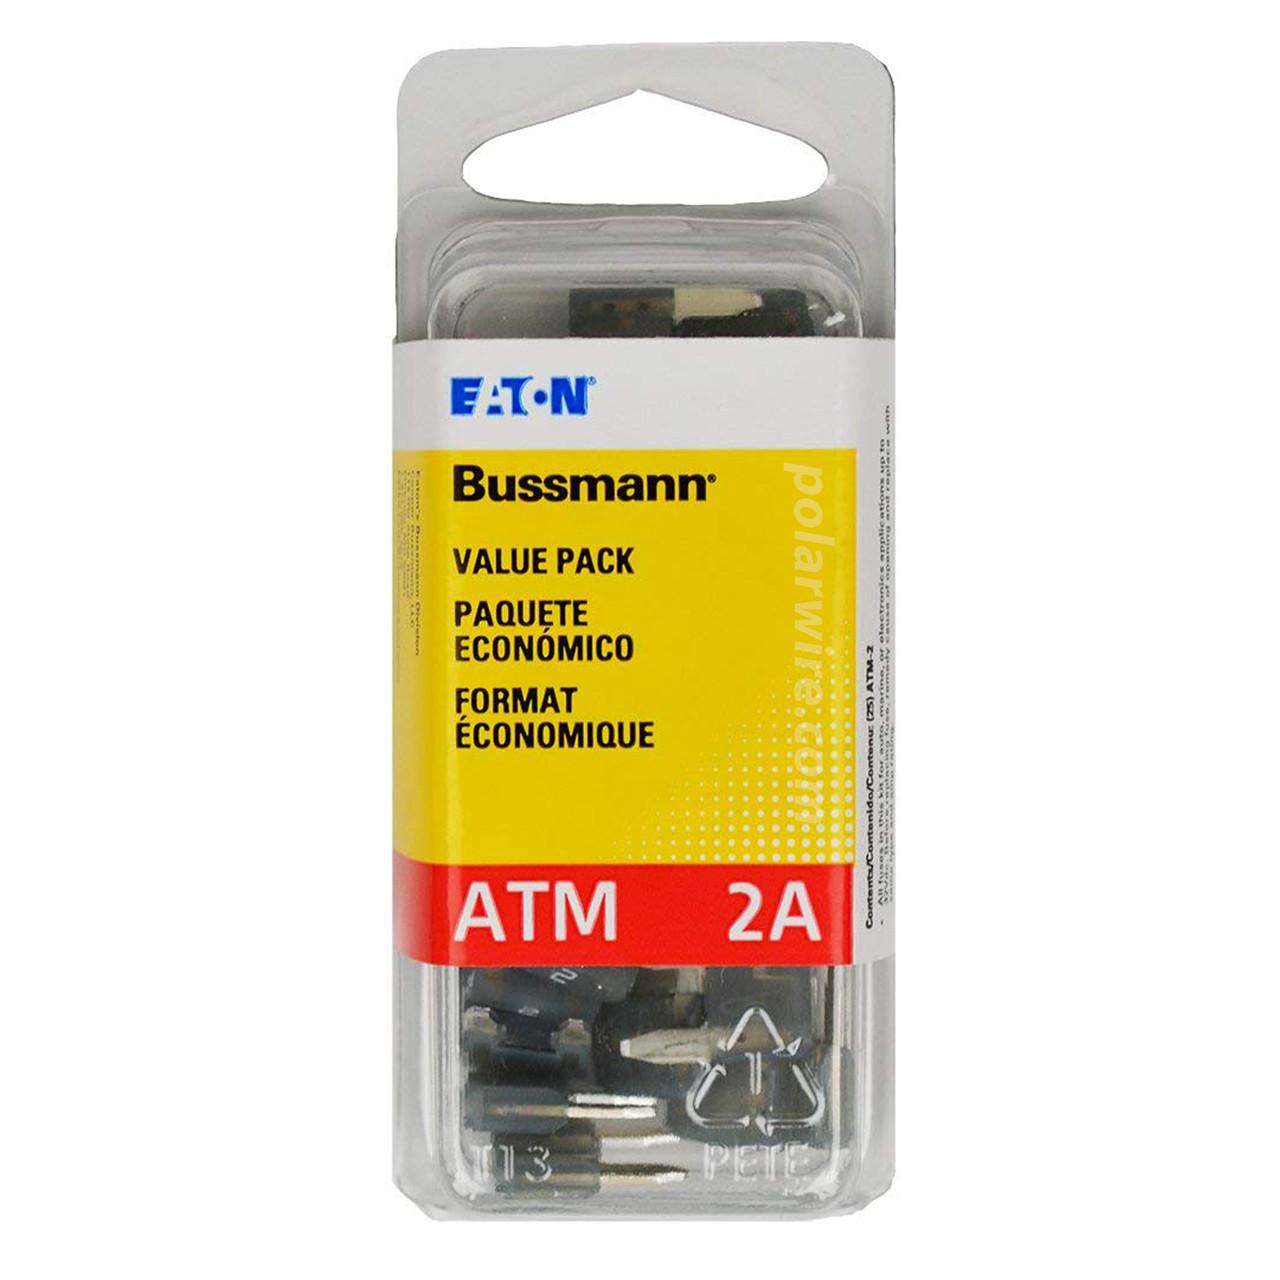 ATM mini blade 2 amp fuse gray Bussmann 25 piece value pack